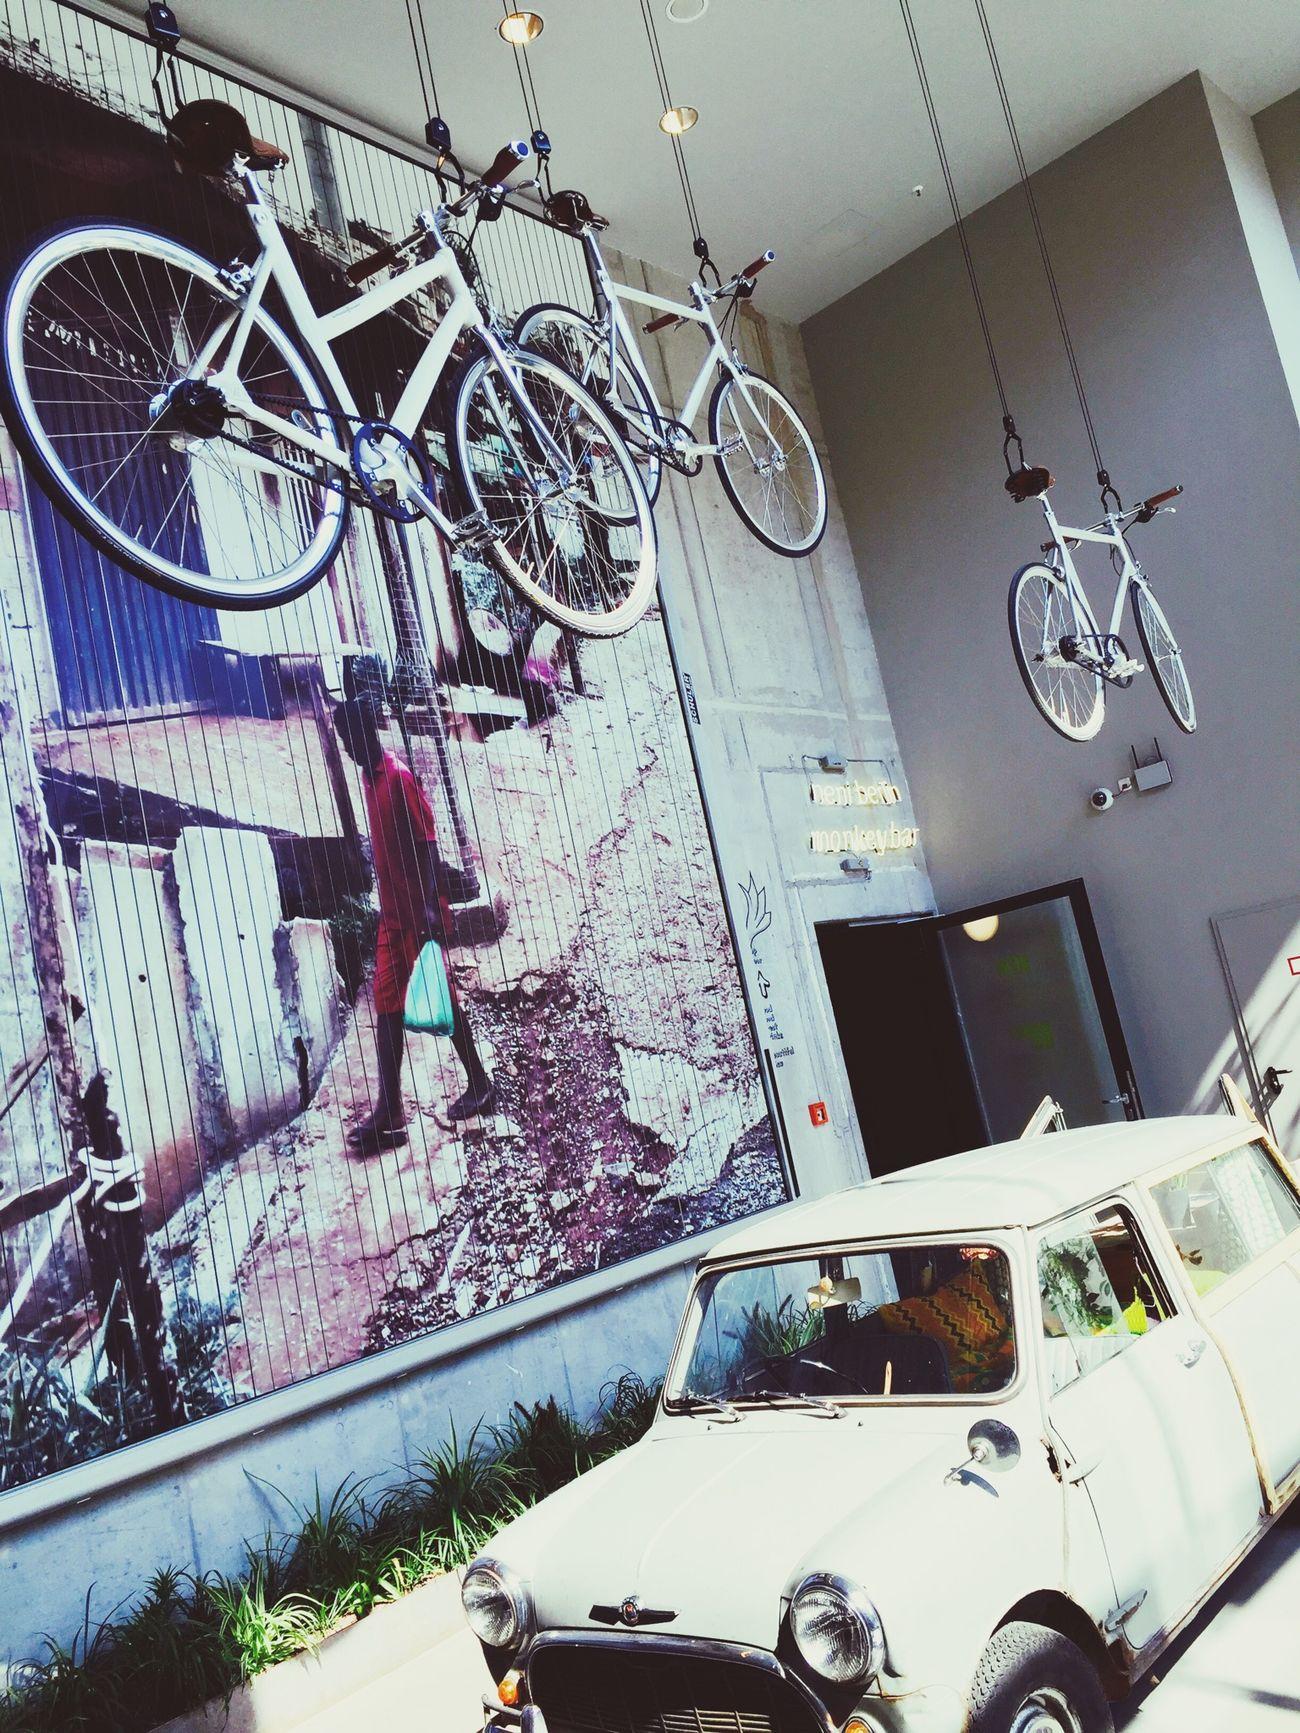 Bikes ... 😕 Berlin 25hourshotel Fahrradtour City Life